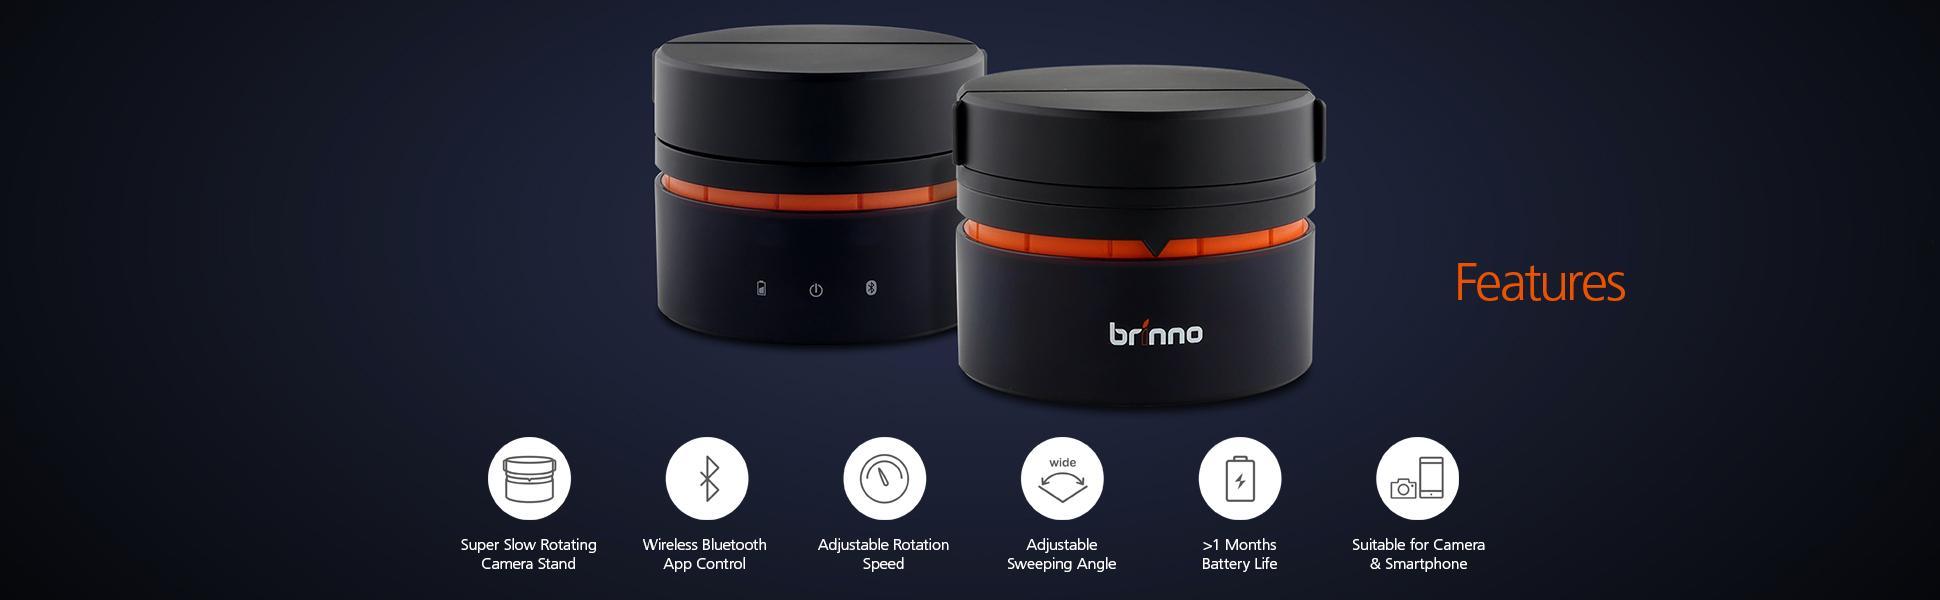 Brinno-ART200-Panning-Head-Features